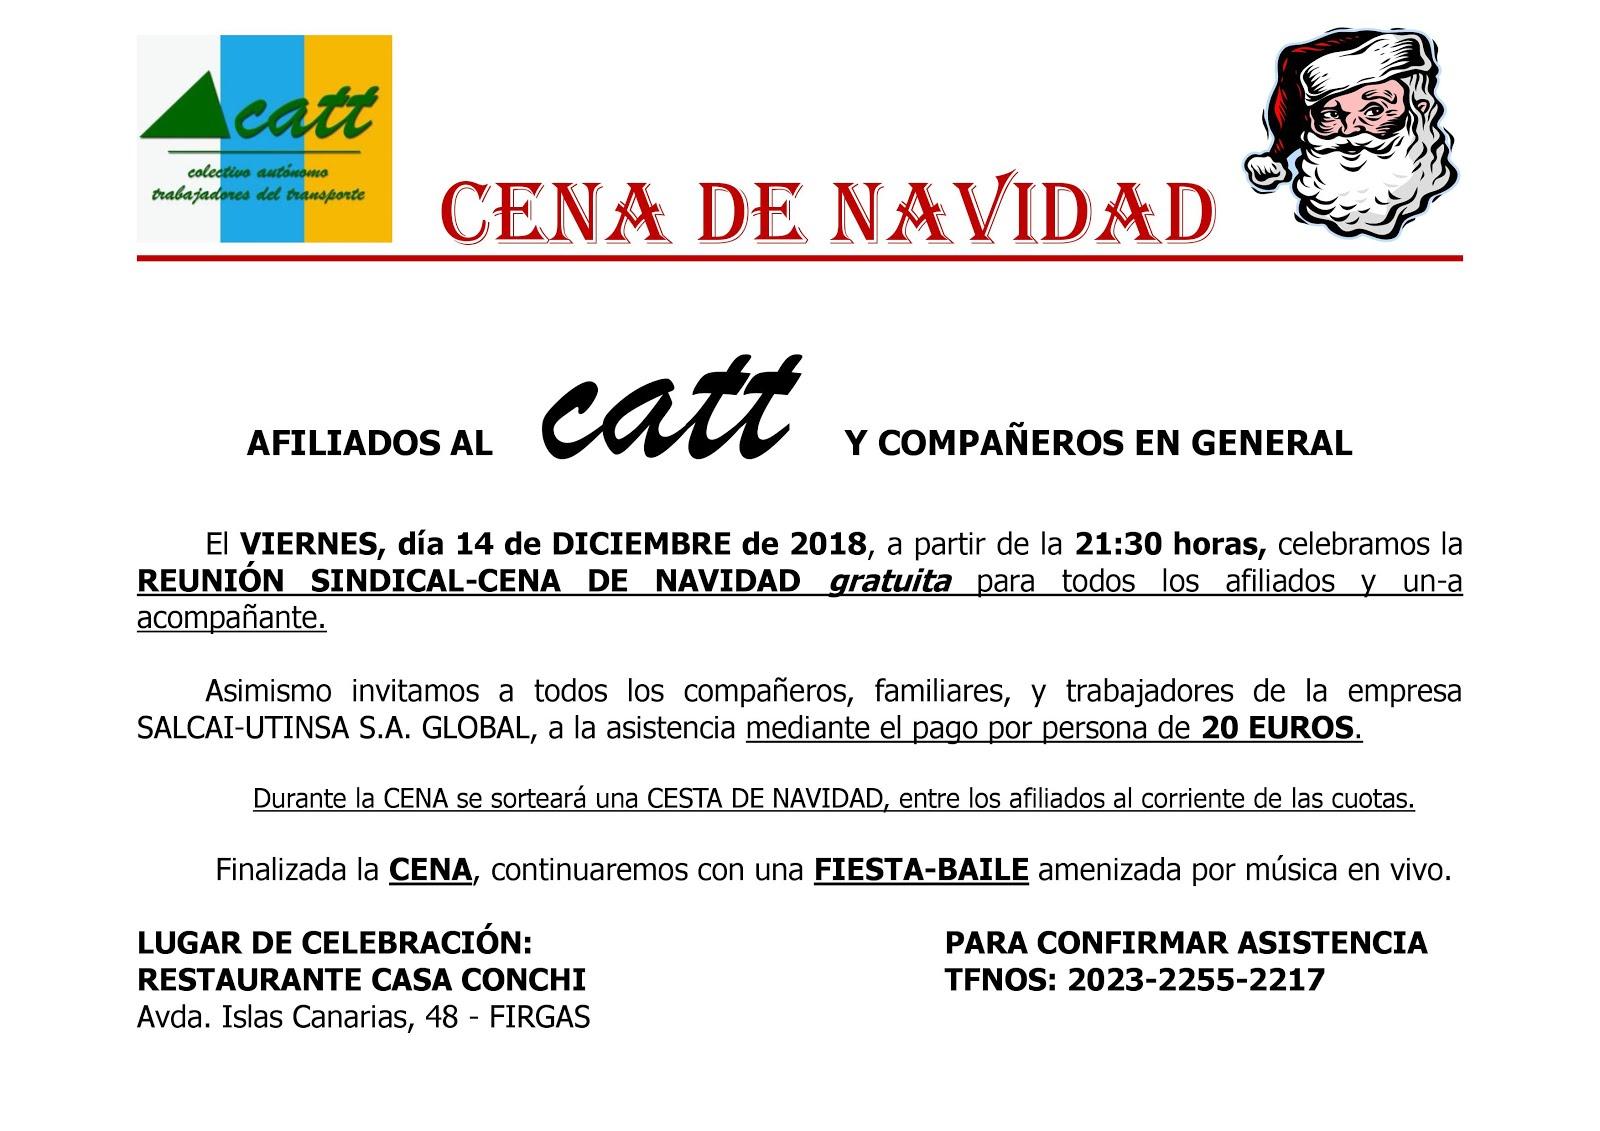 REUNIÓN SINDICAL-CENA DE NAVIDAD CATT 2018